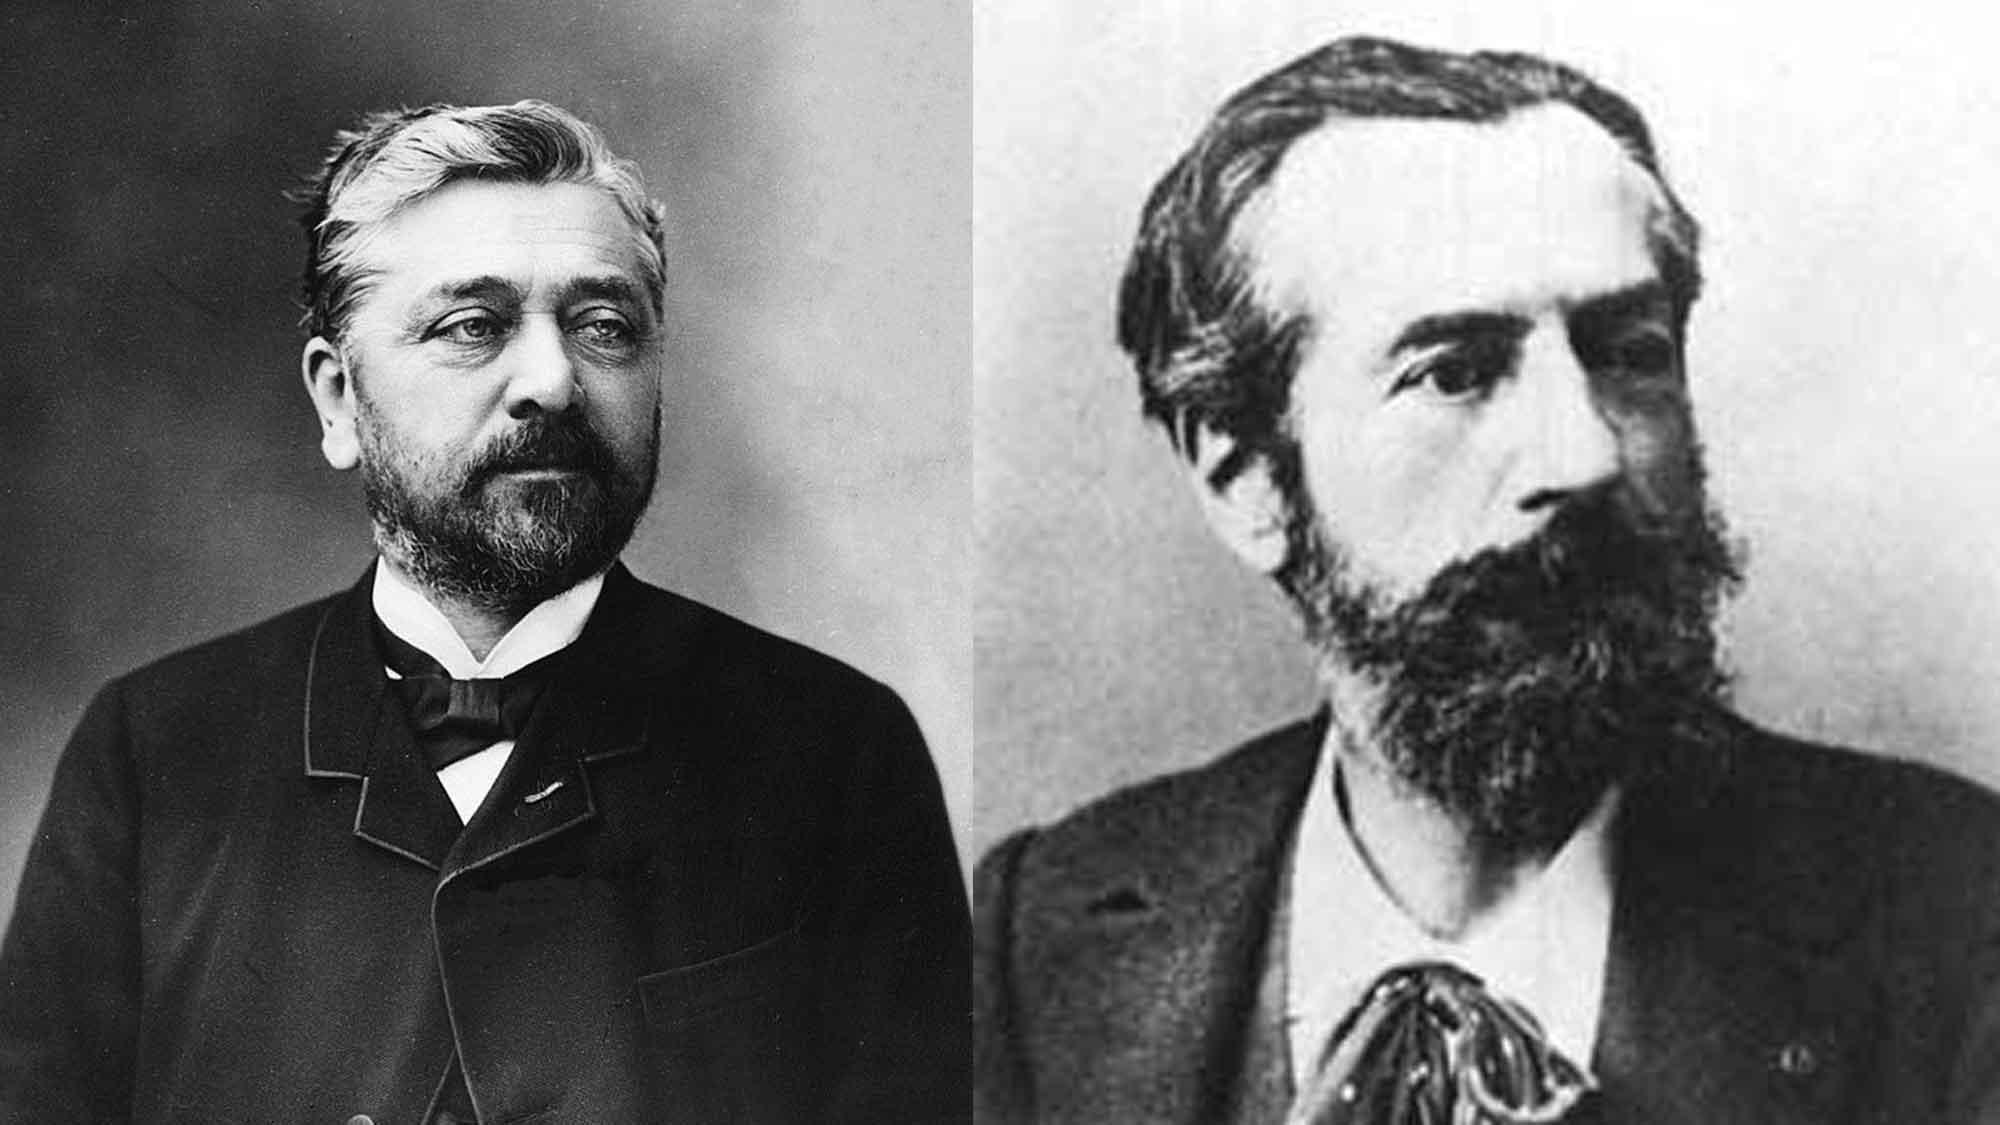 Gustave Eiffel & Frédéric Auguste Bartholdi